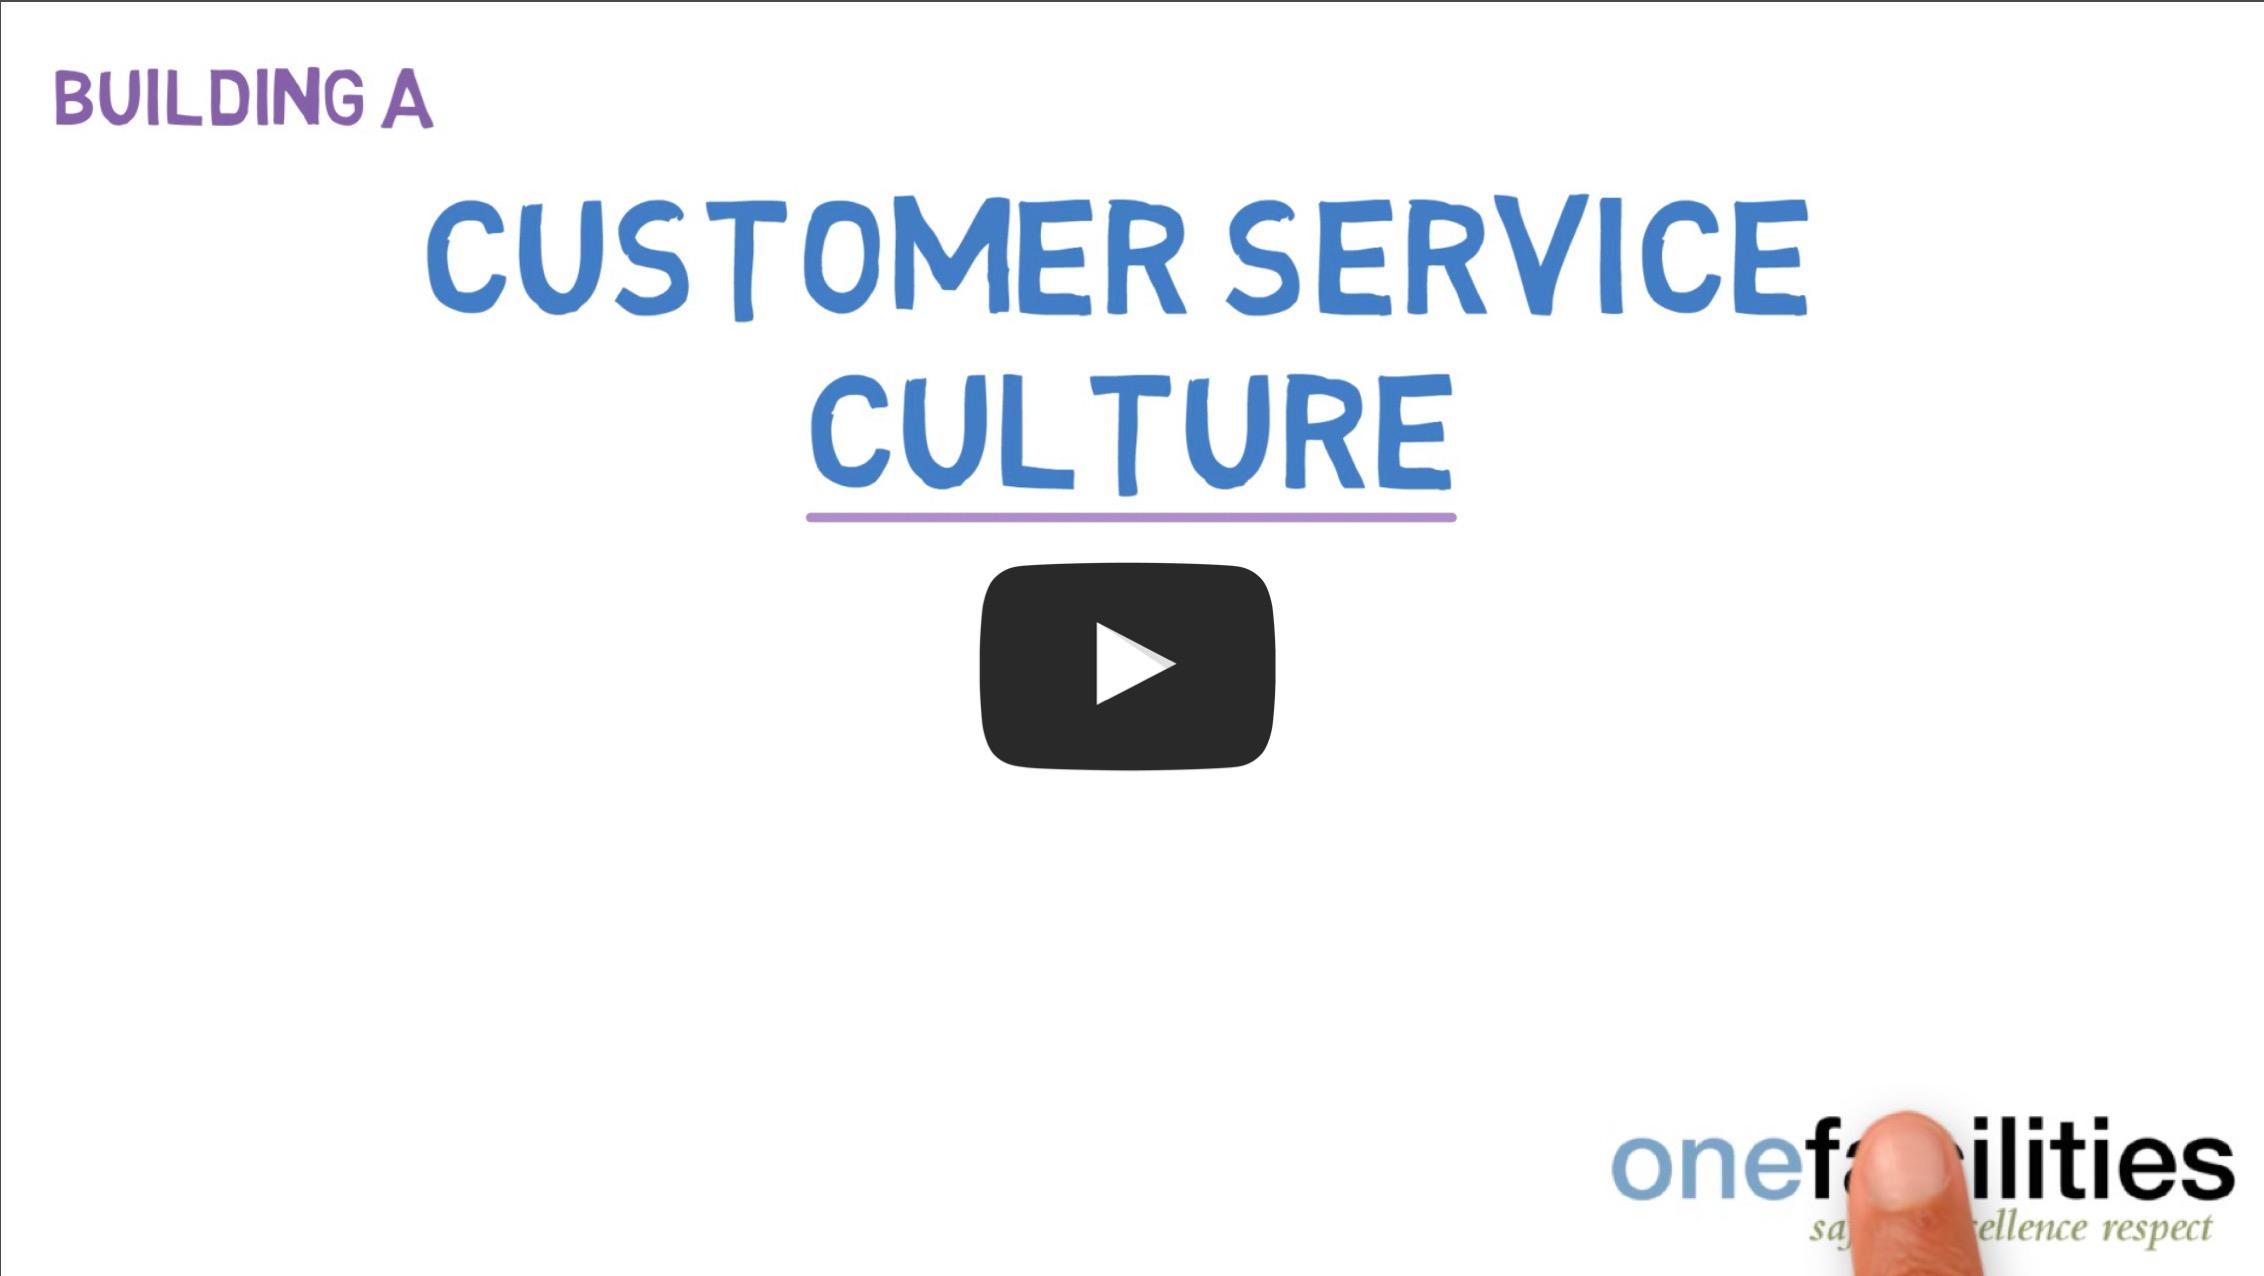 CustomerServiceCulture